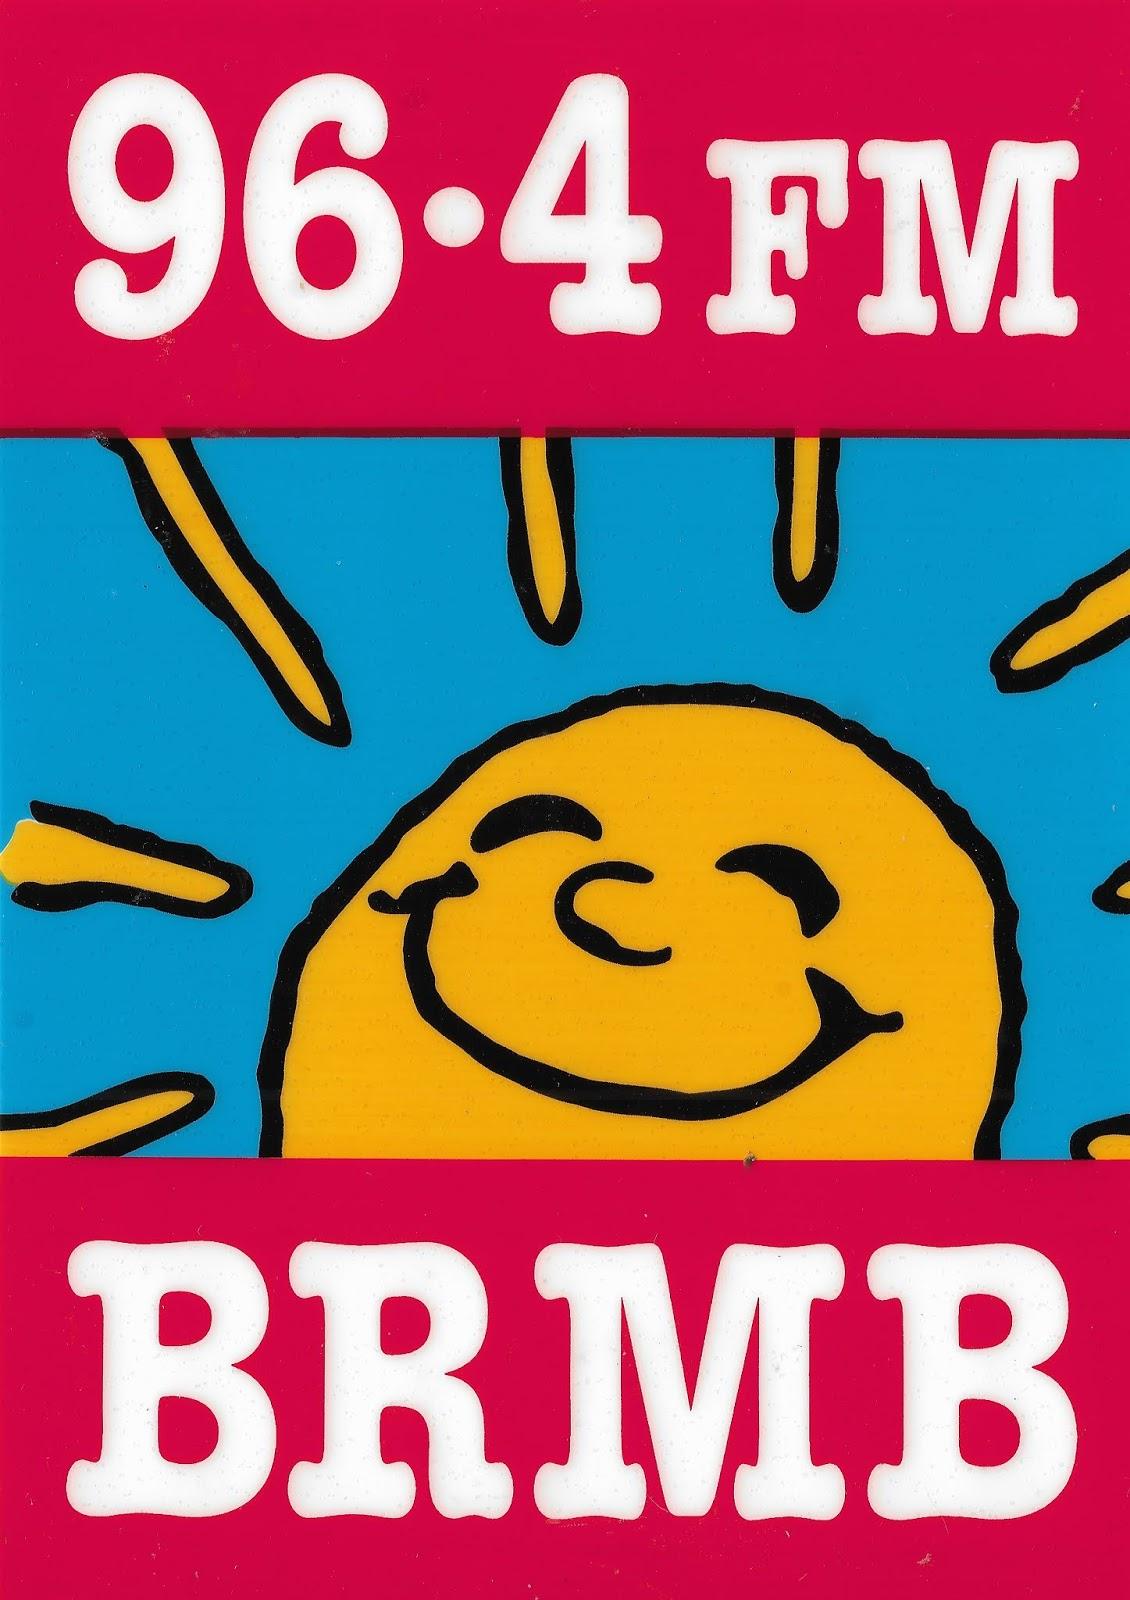 Radio Sticker of the Day: 2018